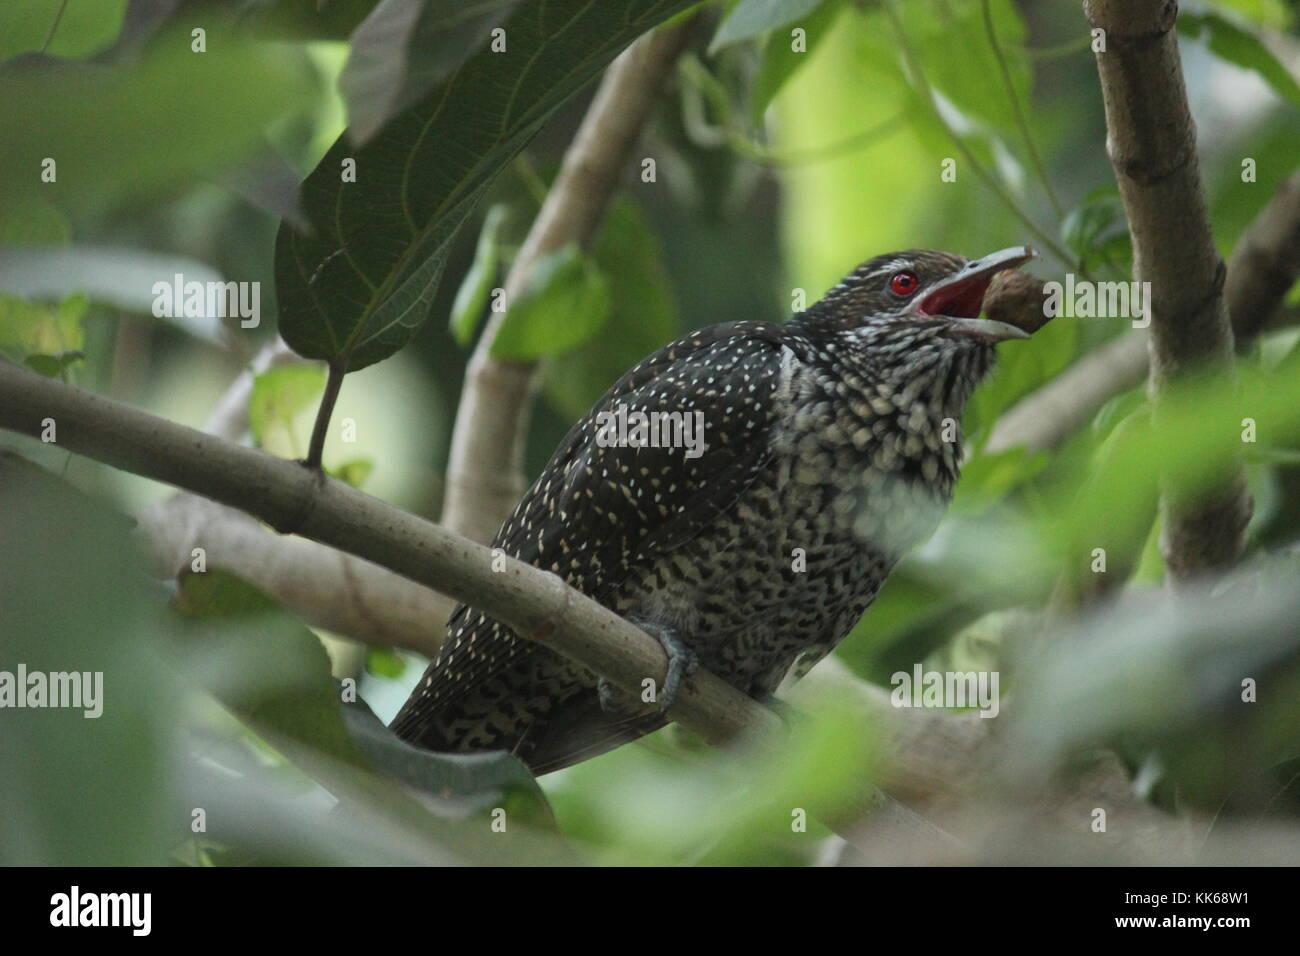 Bird Life - Stock Image